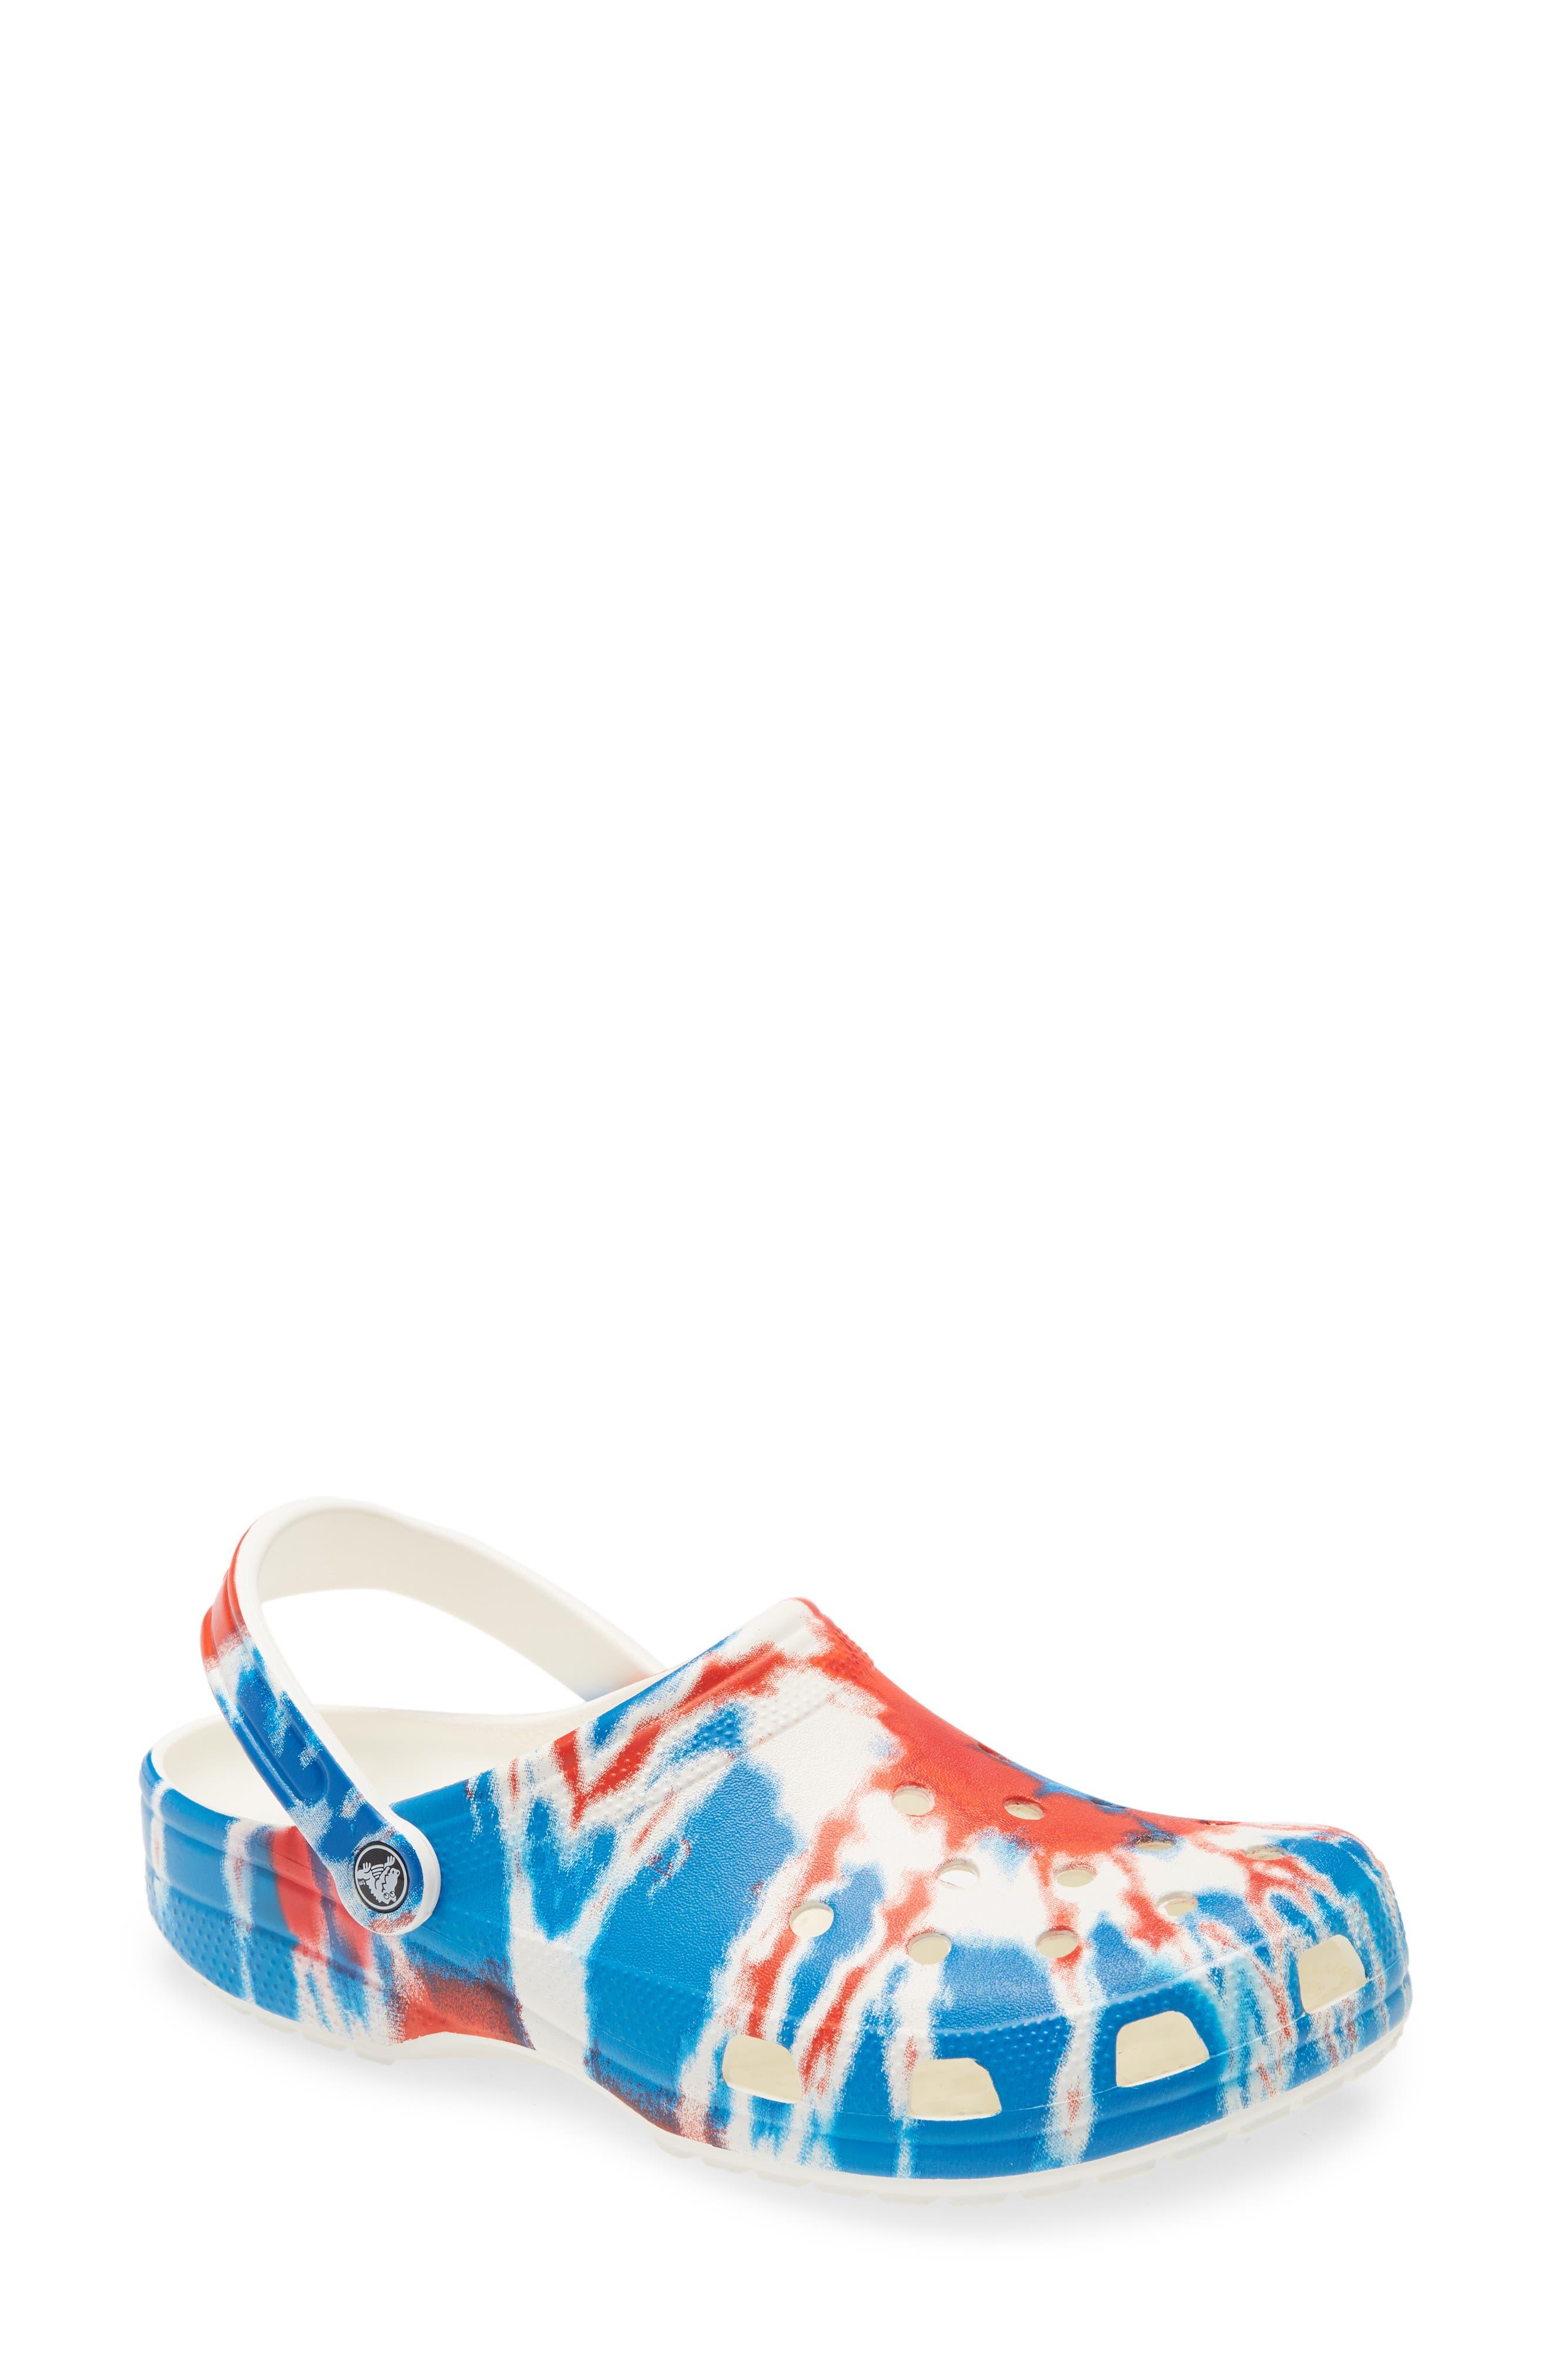 Crocs(TM) Classic Tie Dye Graphic Clog